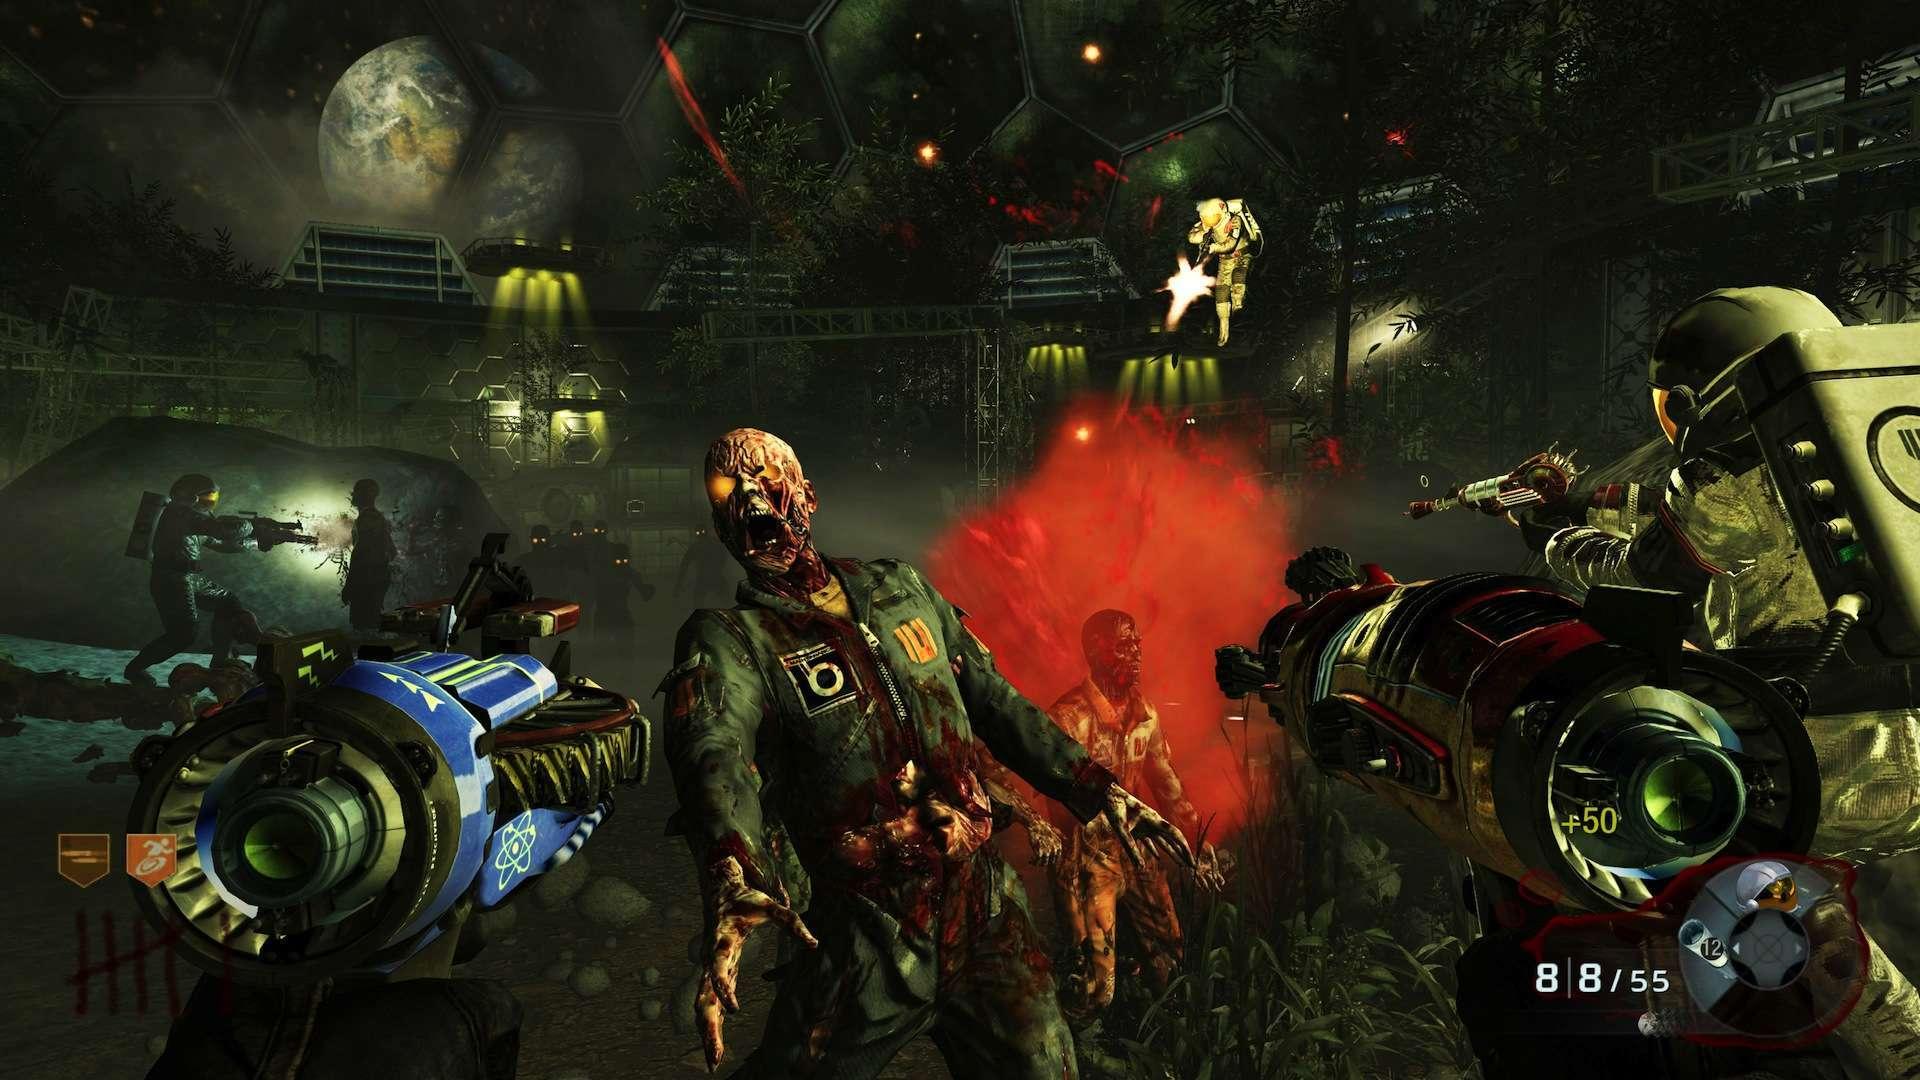 Wallpaper Call Of Duty Black Ops 3 Hd Wallpaper 1080p Upload at 1920x1080